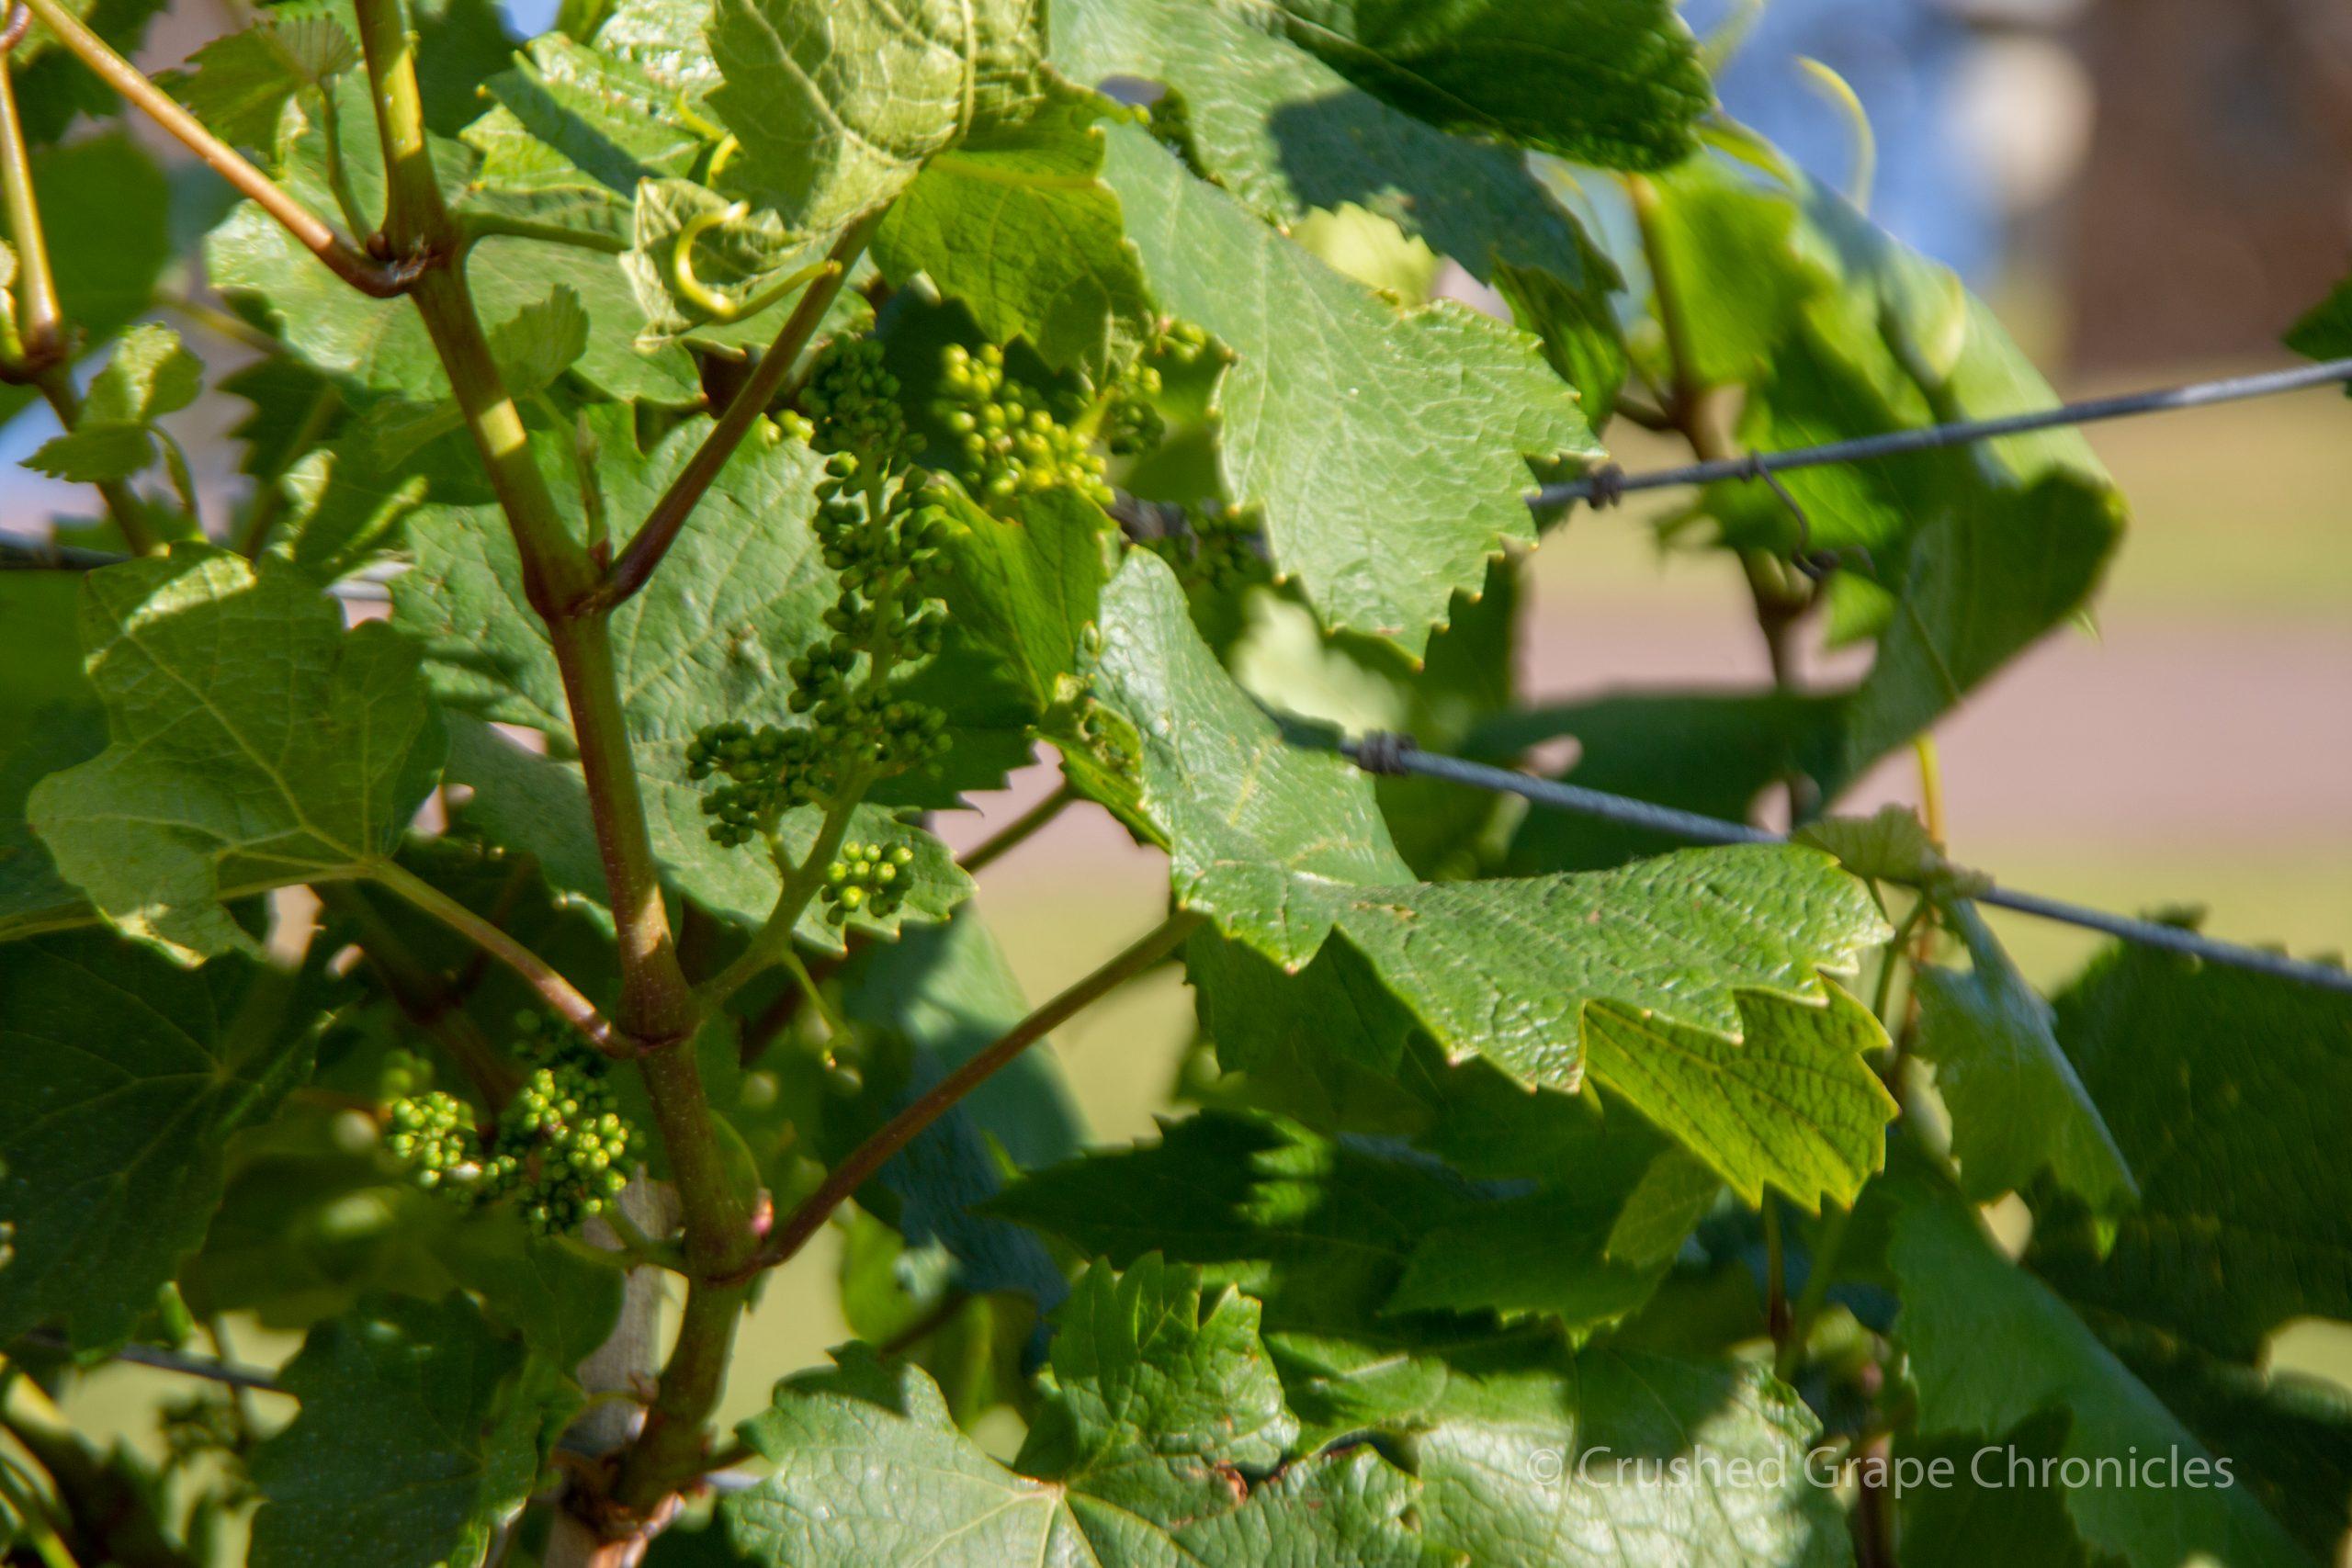 Scarbourgh Wine in Hunter Valley Australia Vineyard